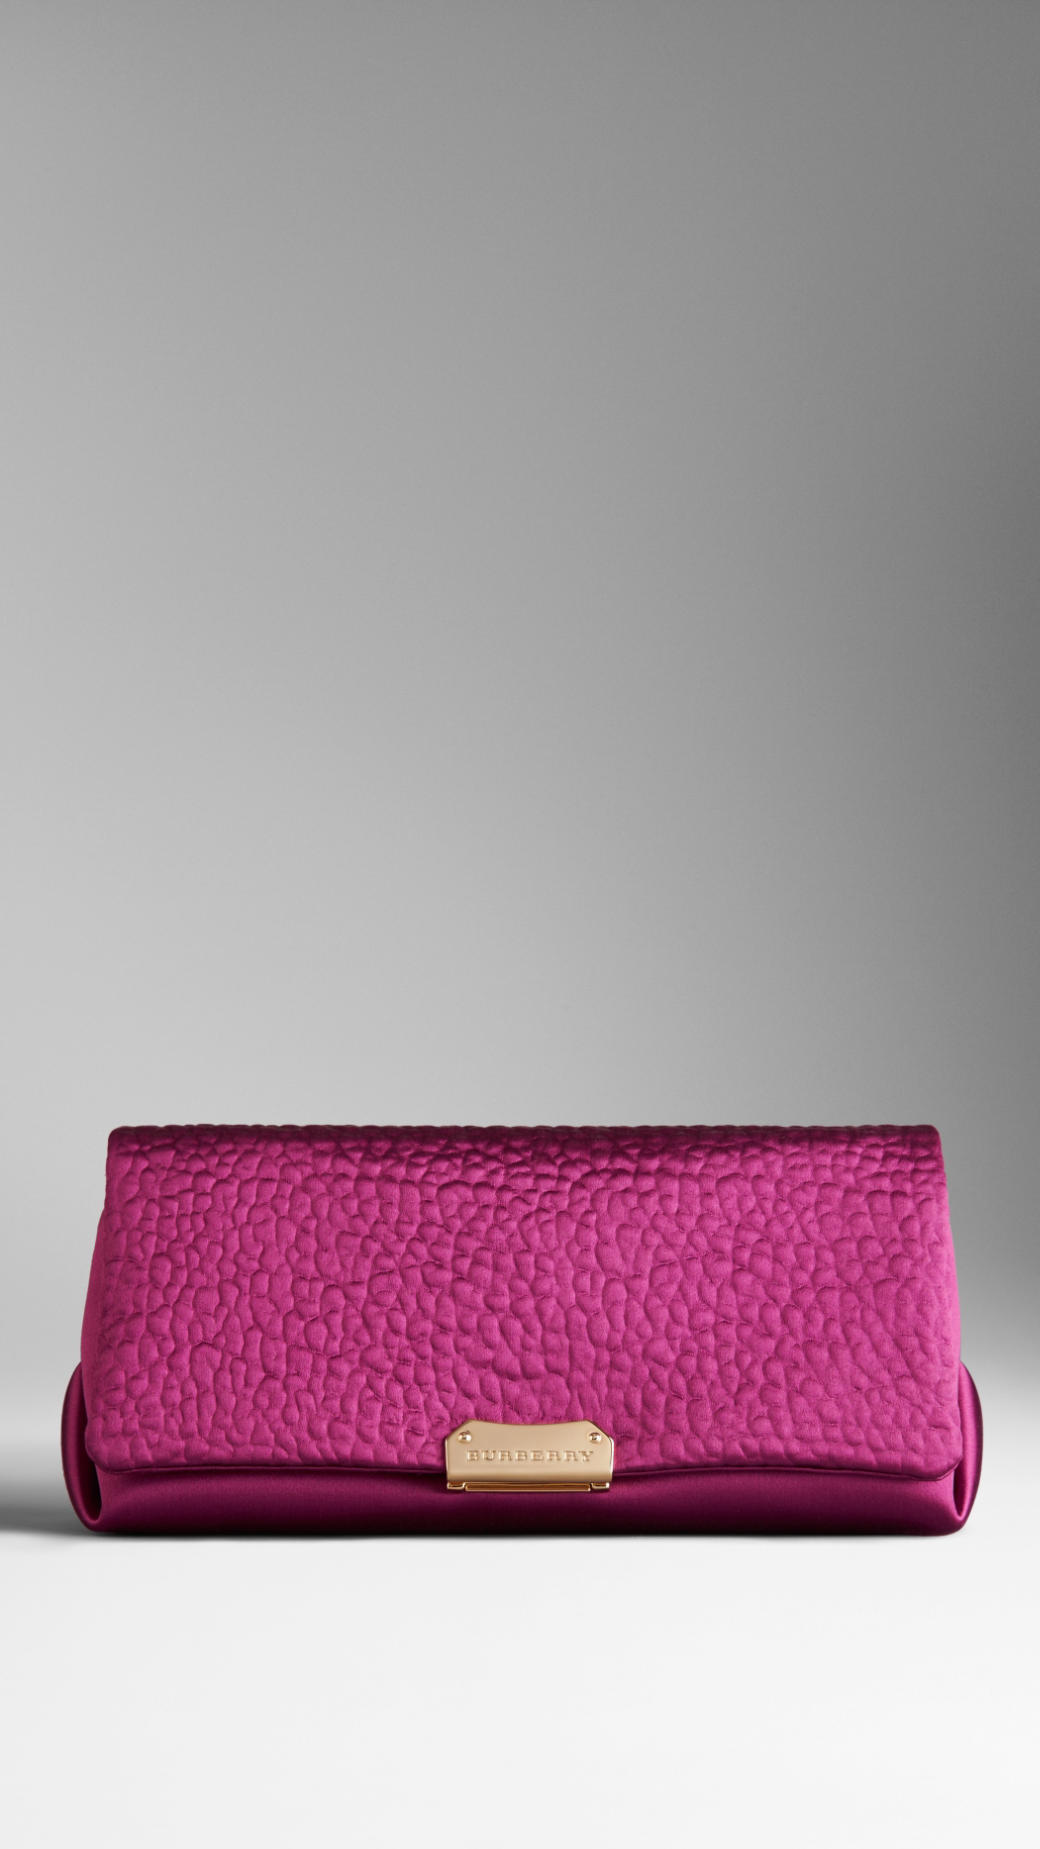 Lyst - Burberry Heritage Grain Satin Clutch Bag In Purple